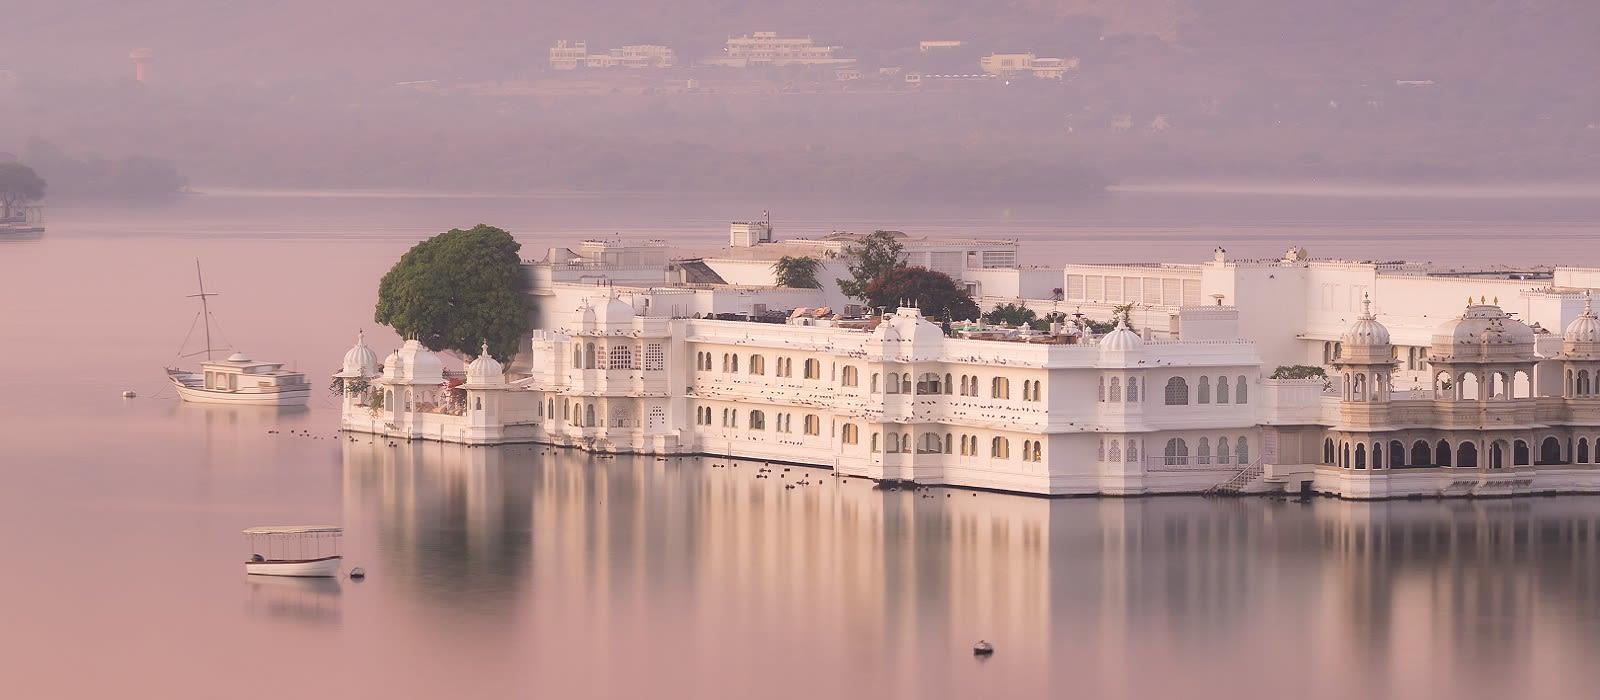 Festival Fever: Diwali in India Tour Trip 6